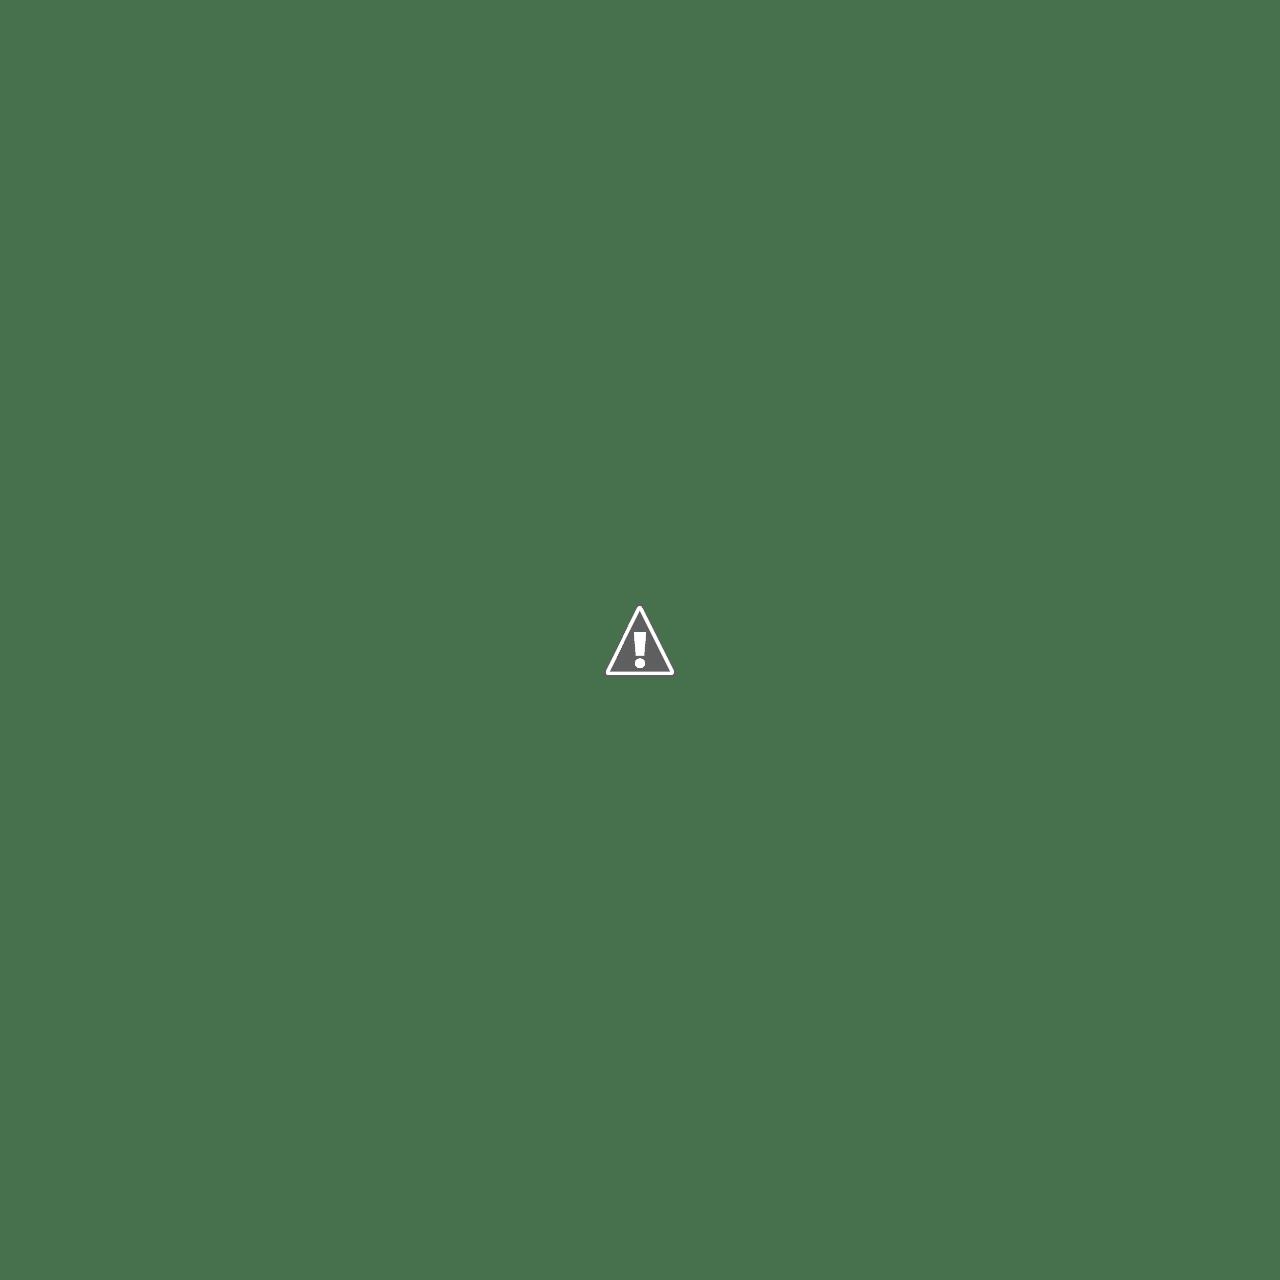 Little Owls Day Nursery & Pre-School - Children's Day Nursery